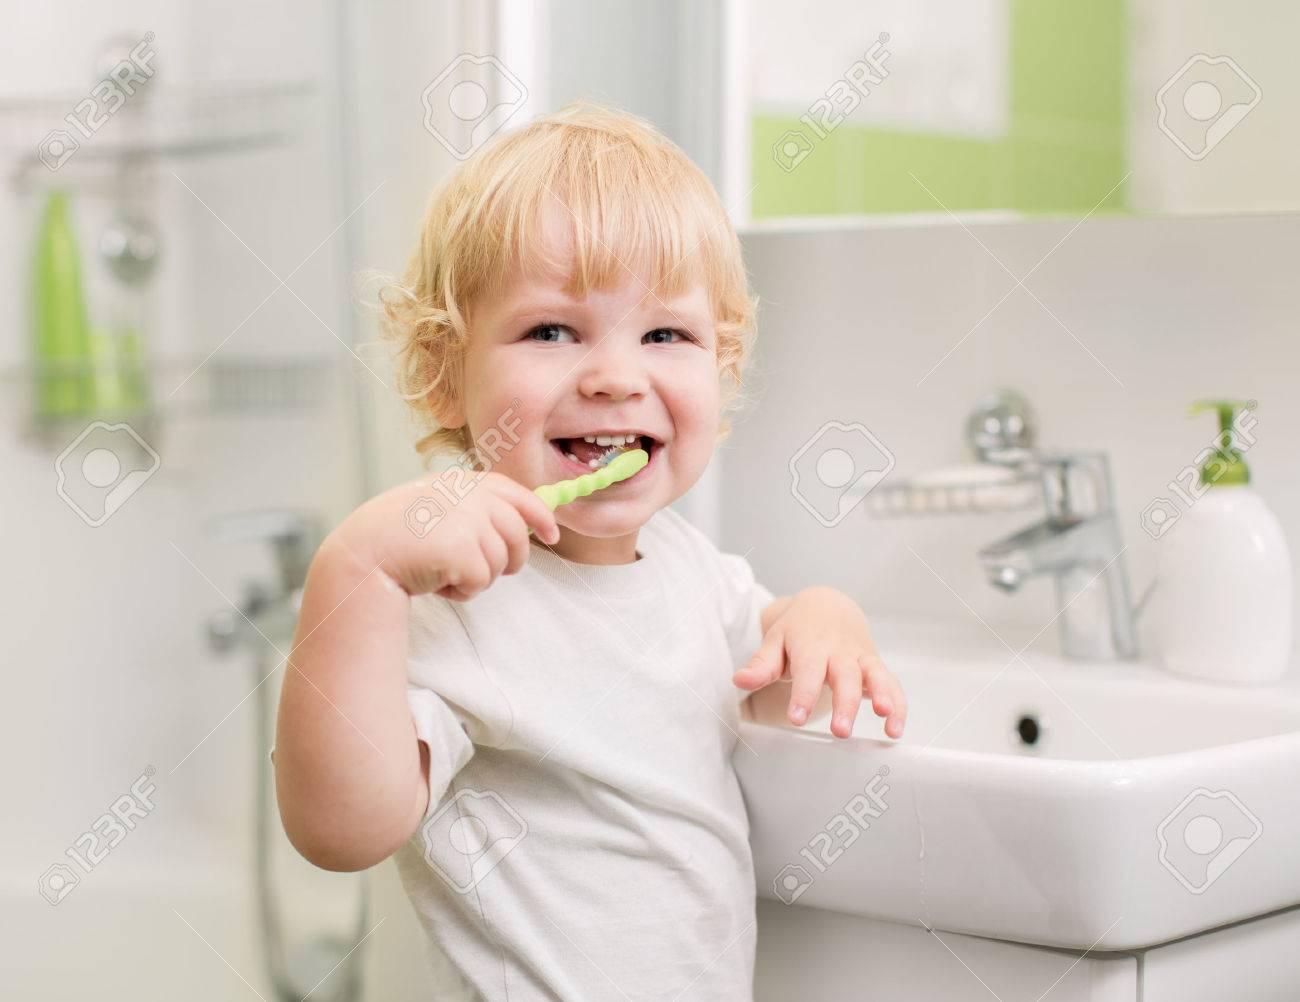 Happy kid brushing teeth Stock Photo - 22273559